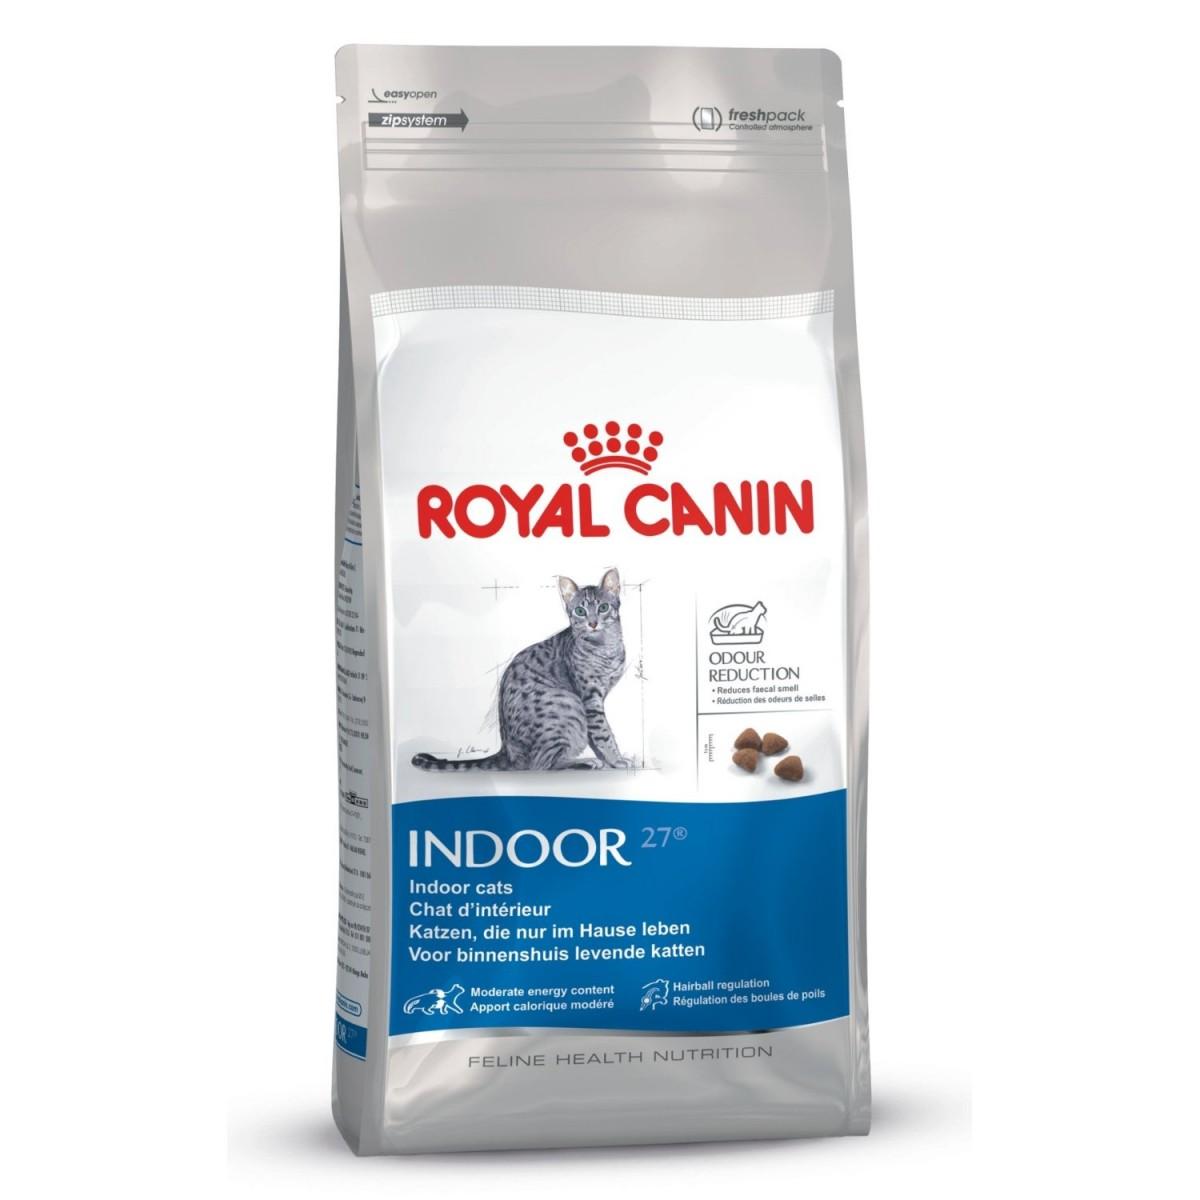 Royal Canin Indoor | 400g Katzenfutter für Hauskatzen